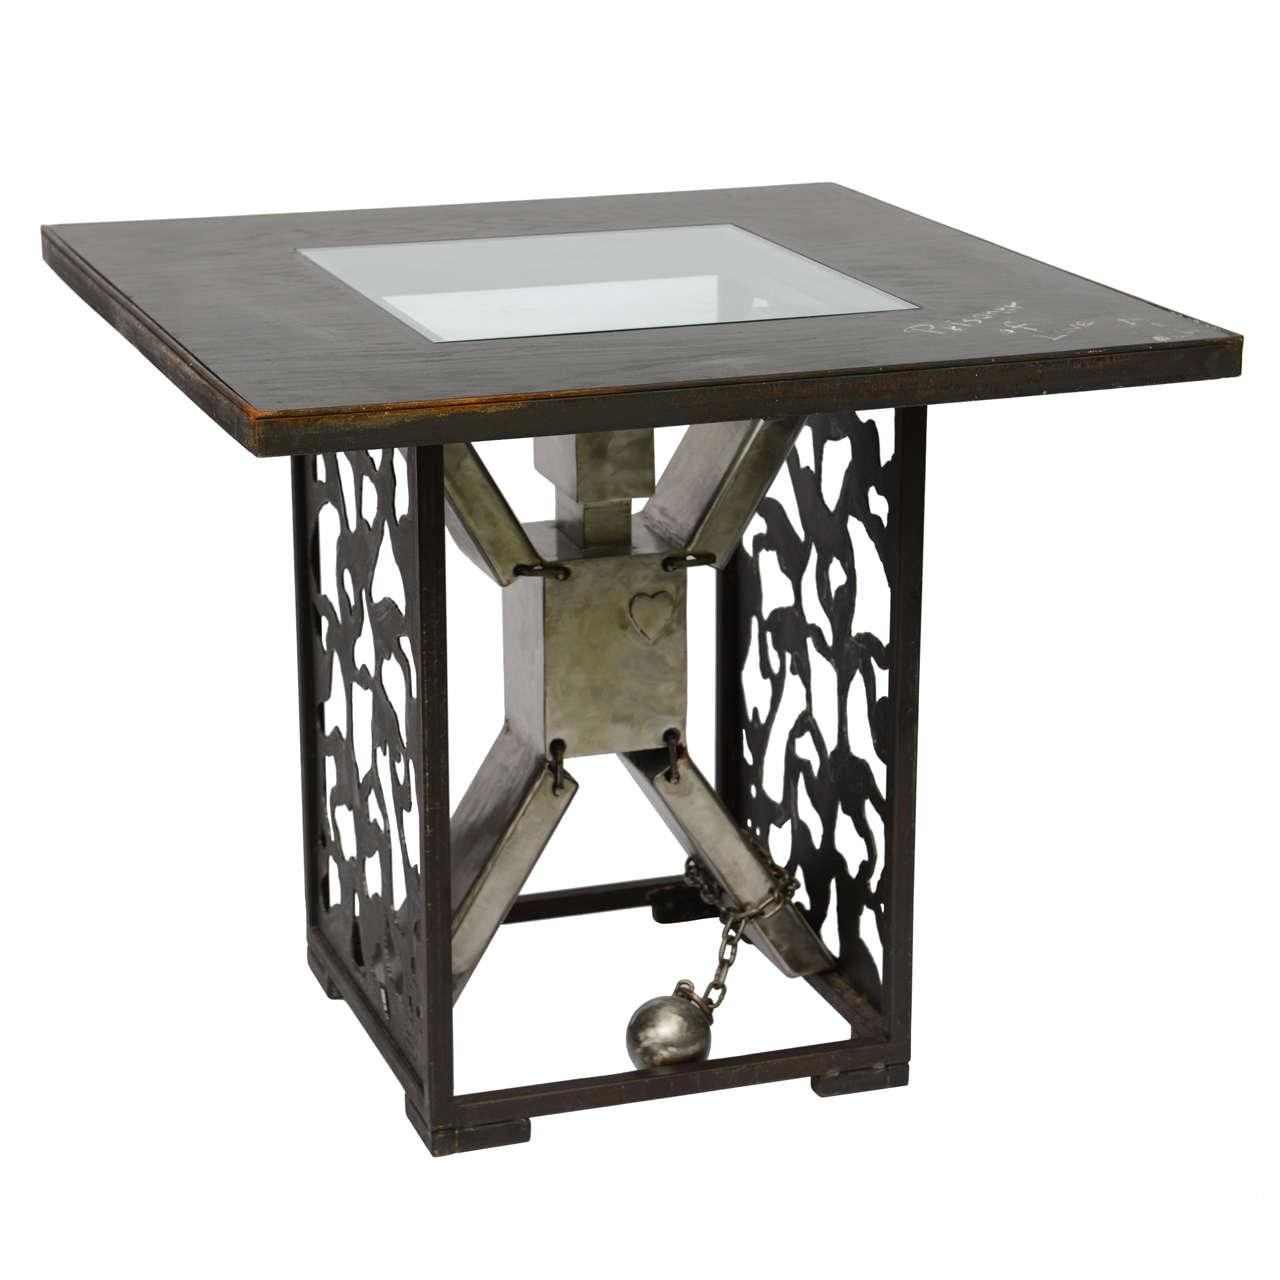 Dining or Center Table- Ronn Jaffe Ltd. Edition Design 'Survival' Functional Art